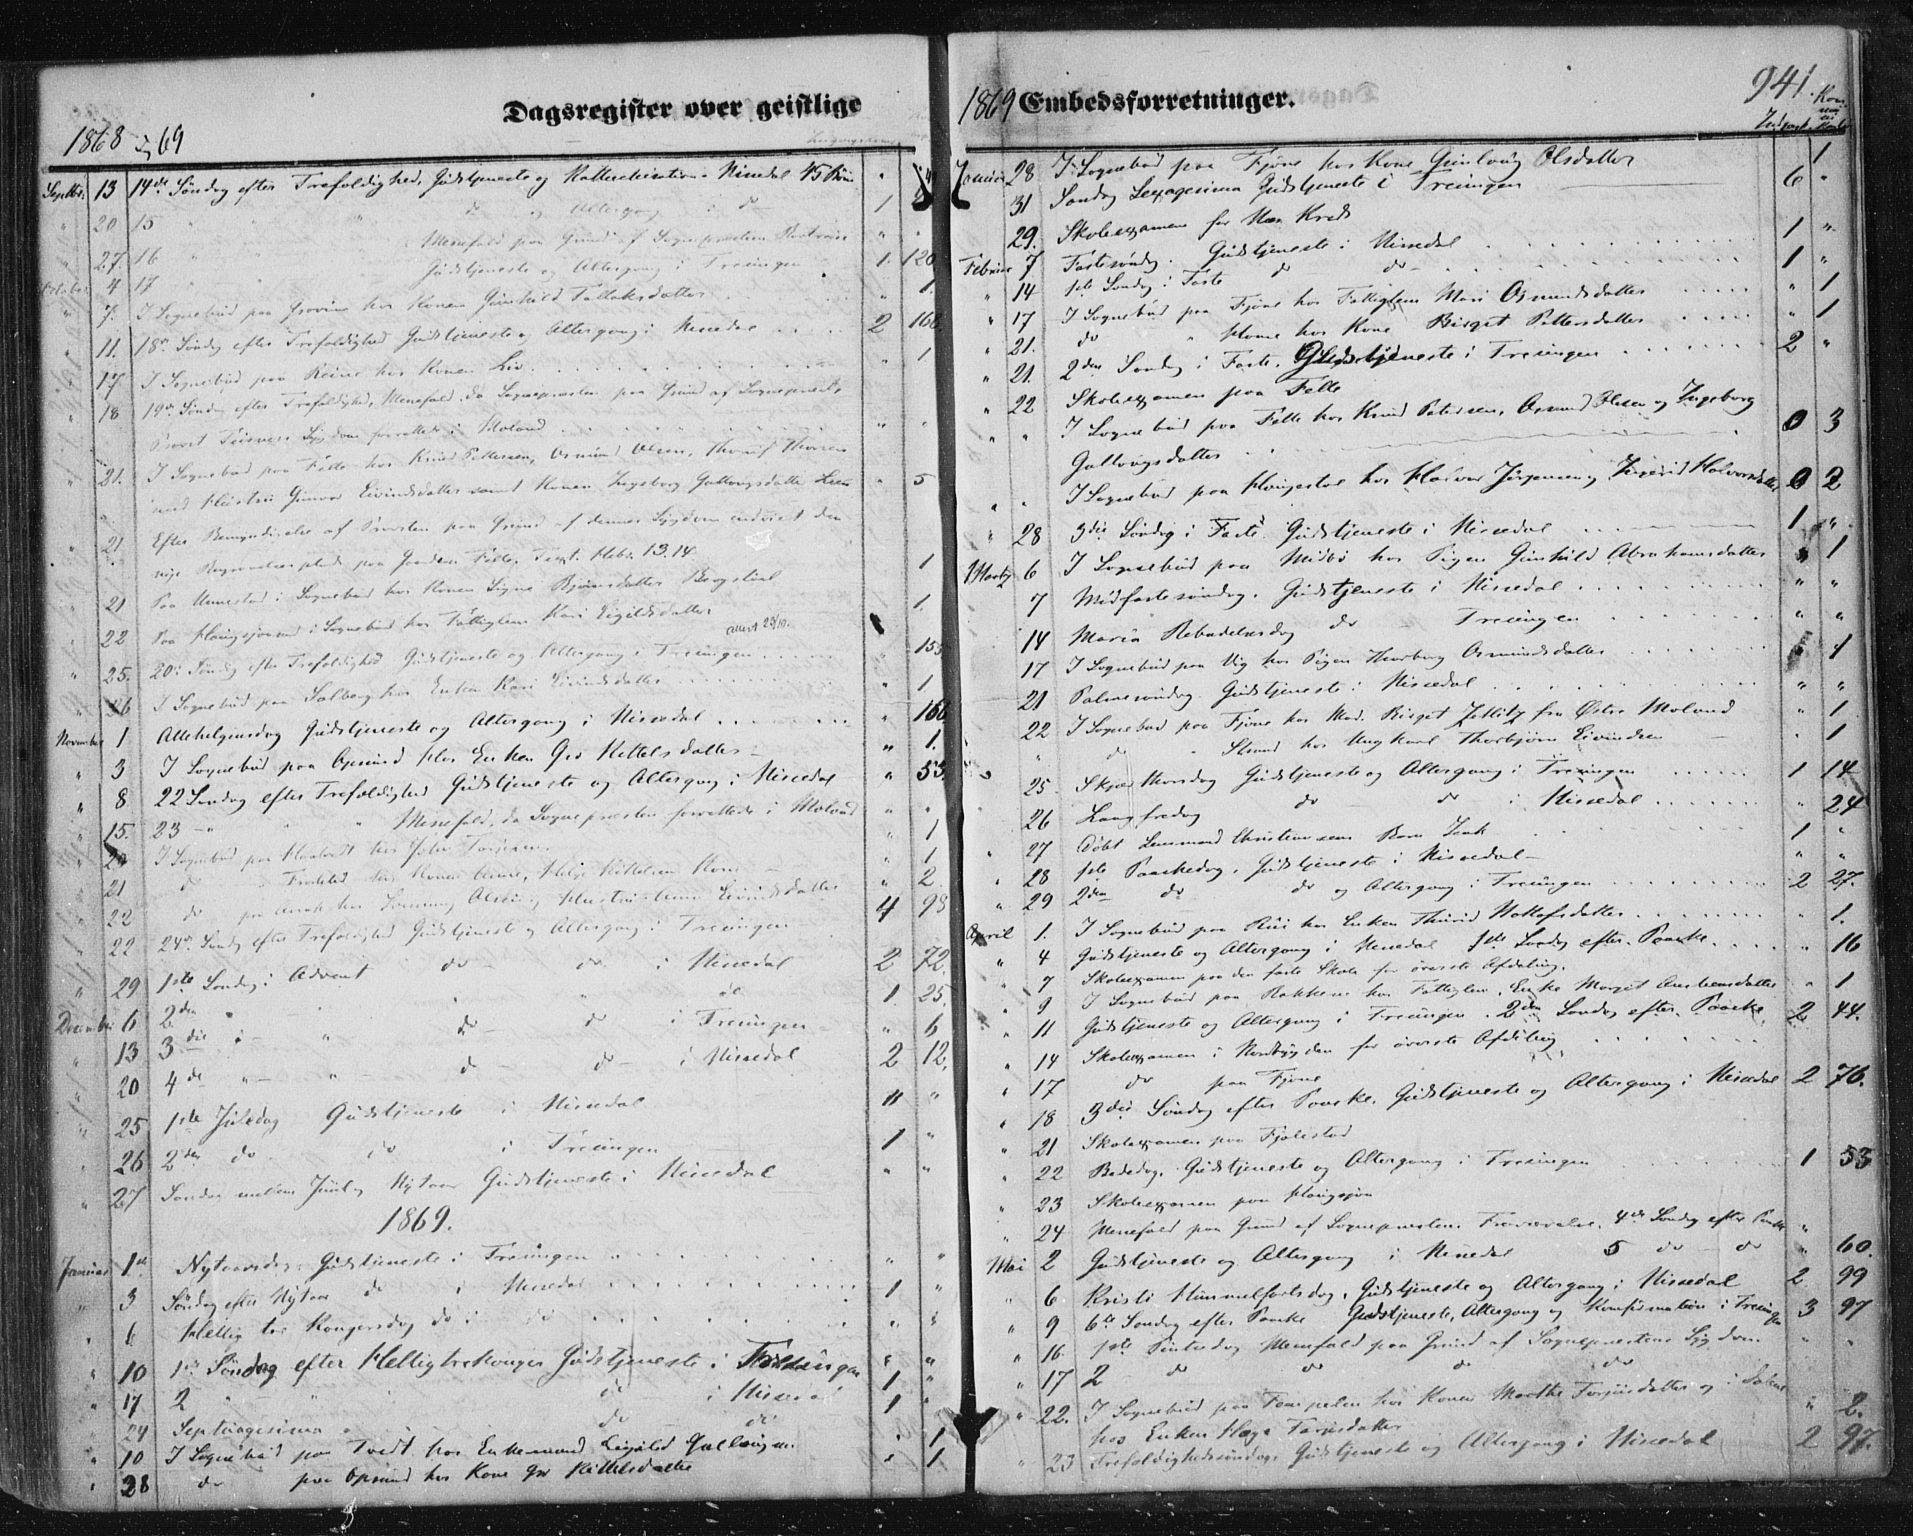 SAKO, Nissedal kirkebøker, F/Fa/L0003: Ministerialbok nr. I 3, 1846-1870, s. 940-941